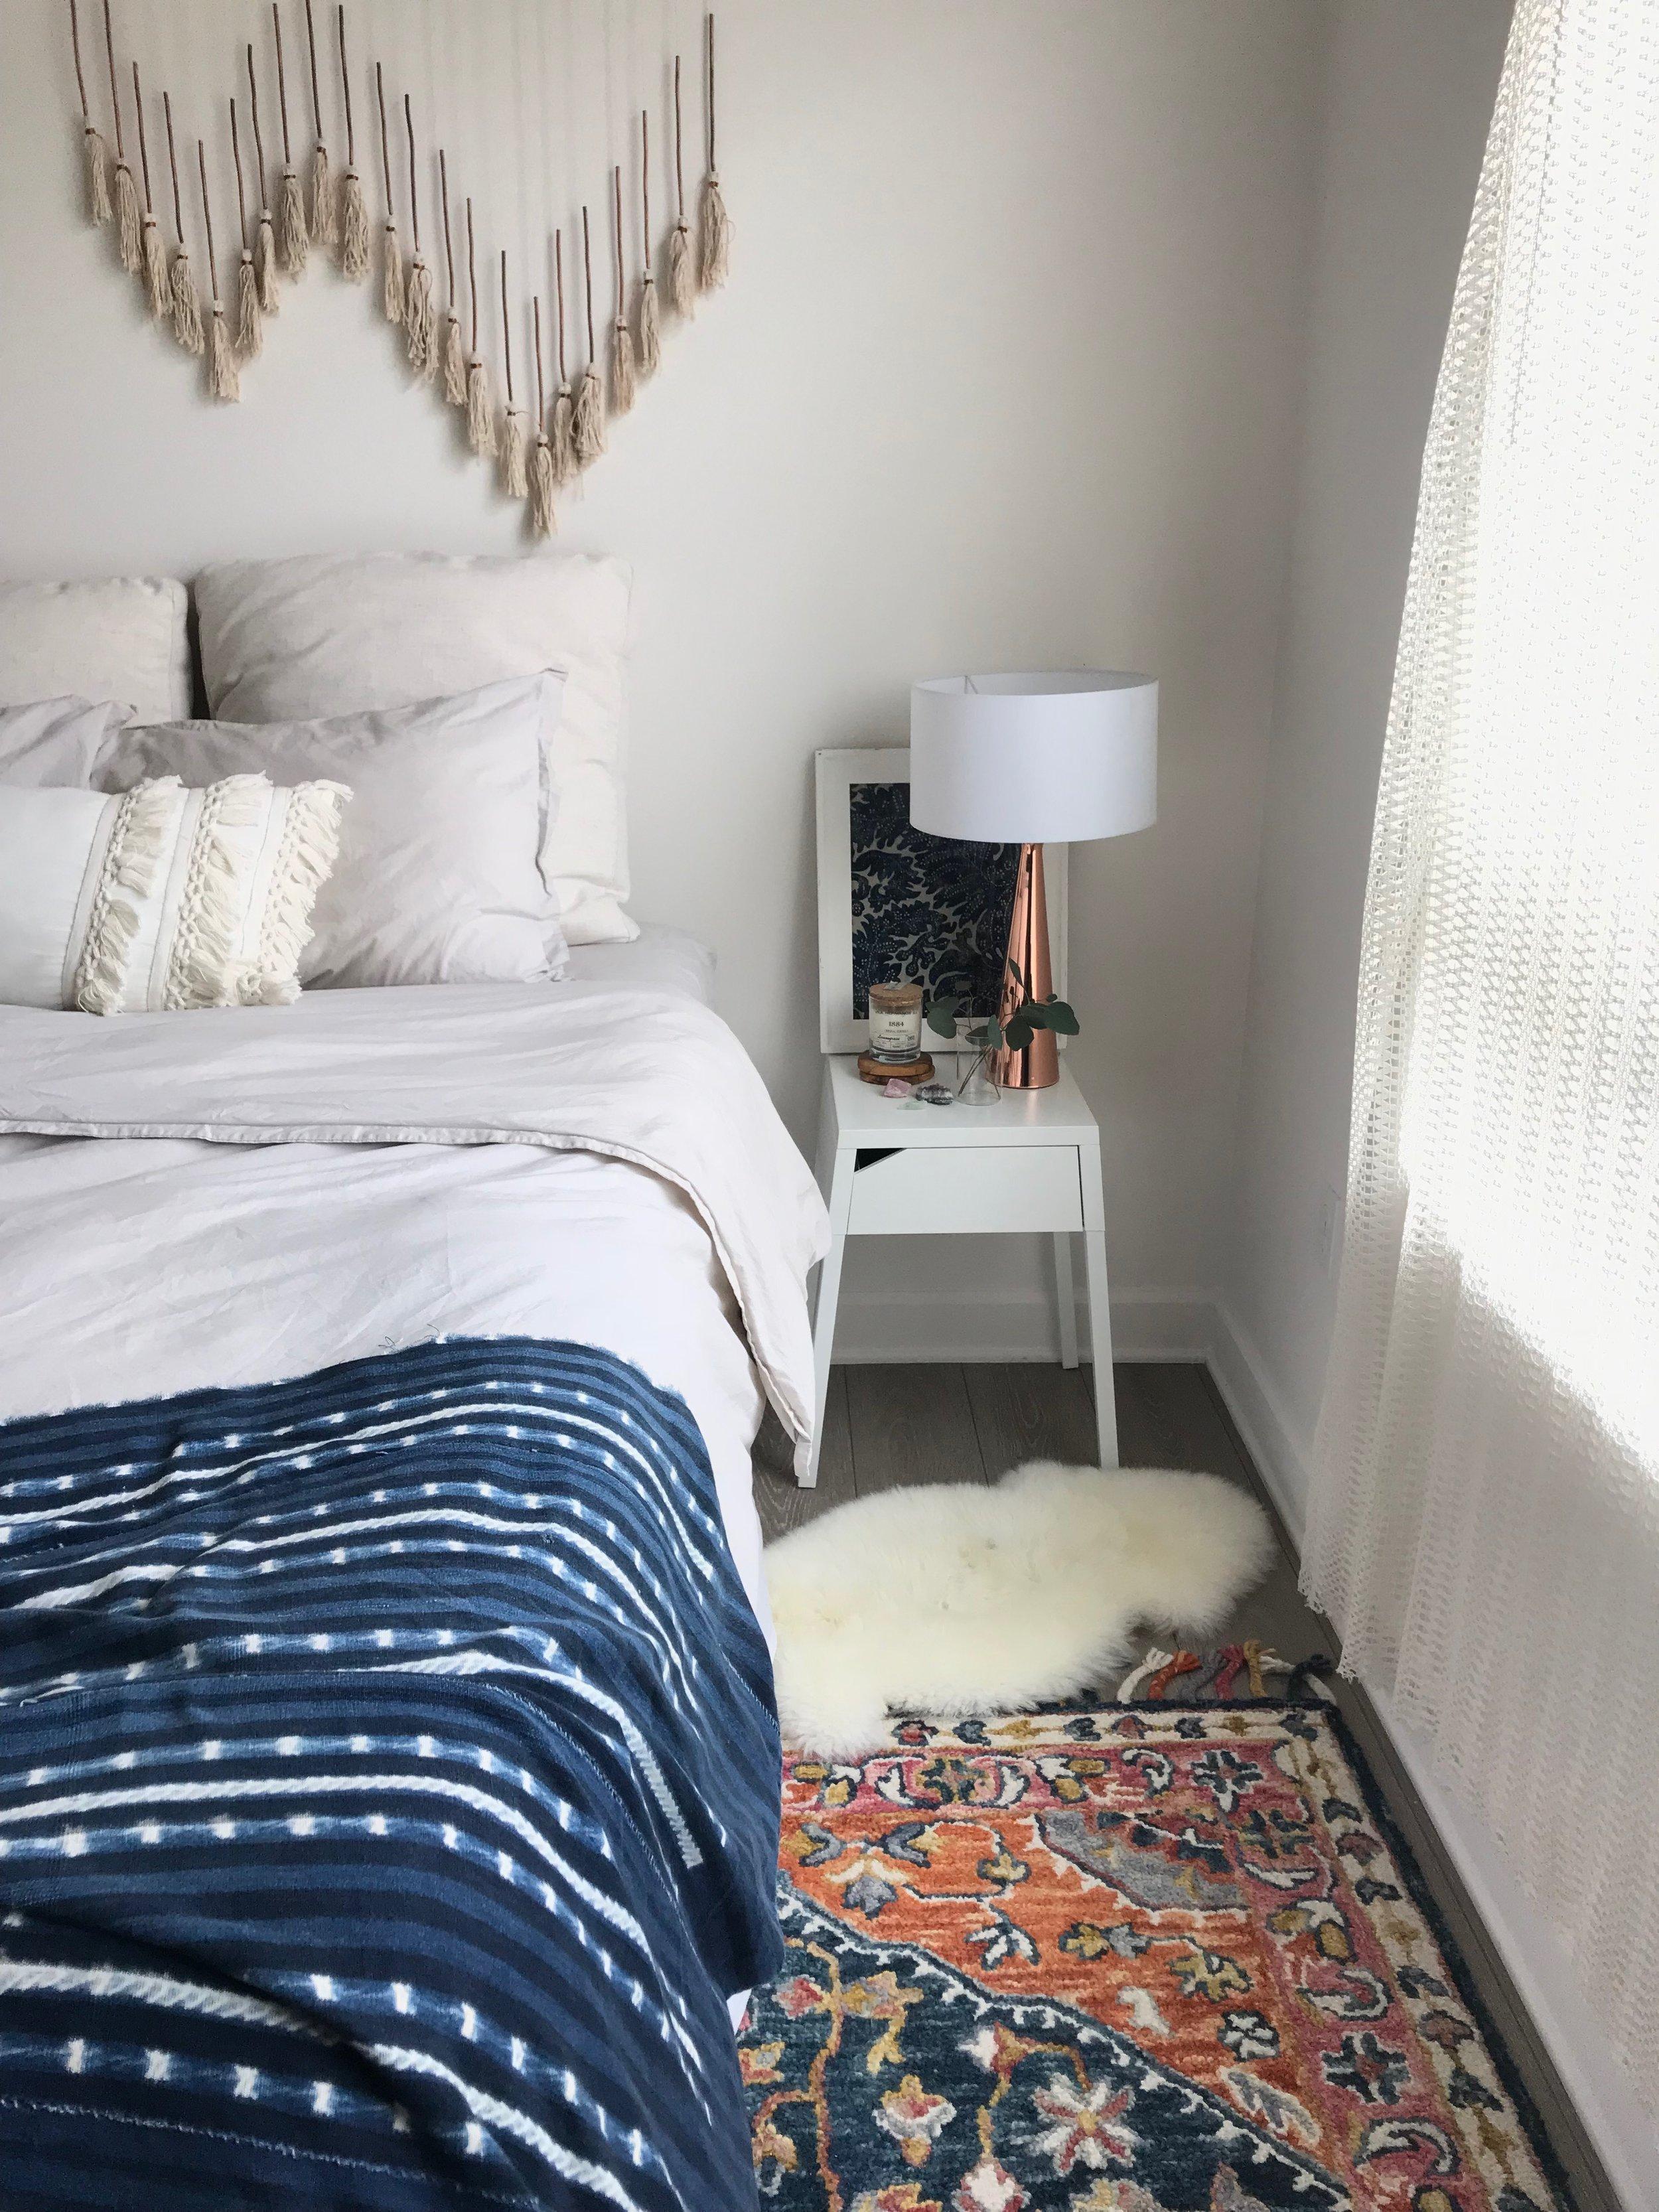 Design Worthy Interiors Claire Worth Parkinson living room #cktradesecrets #interiordesignbusiness #realdesigner #interiordesignerinterview